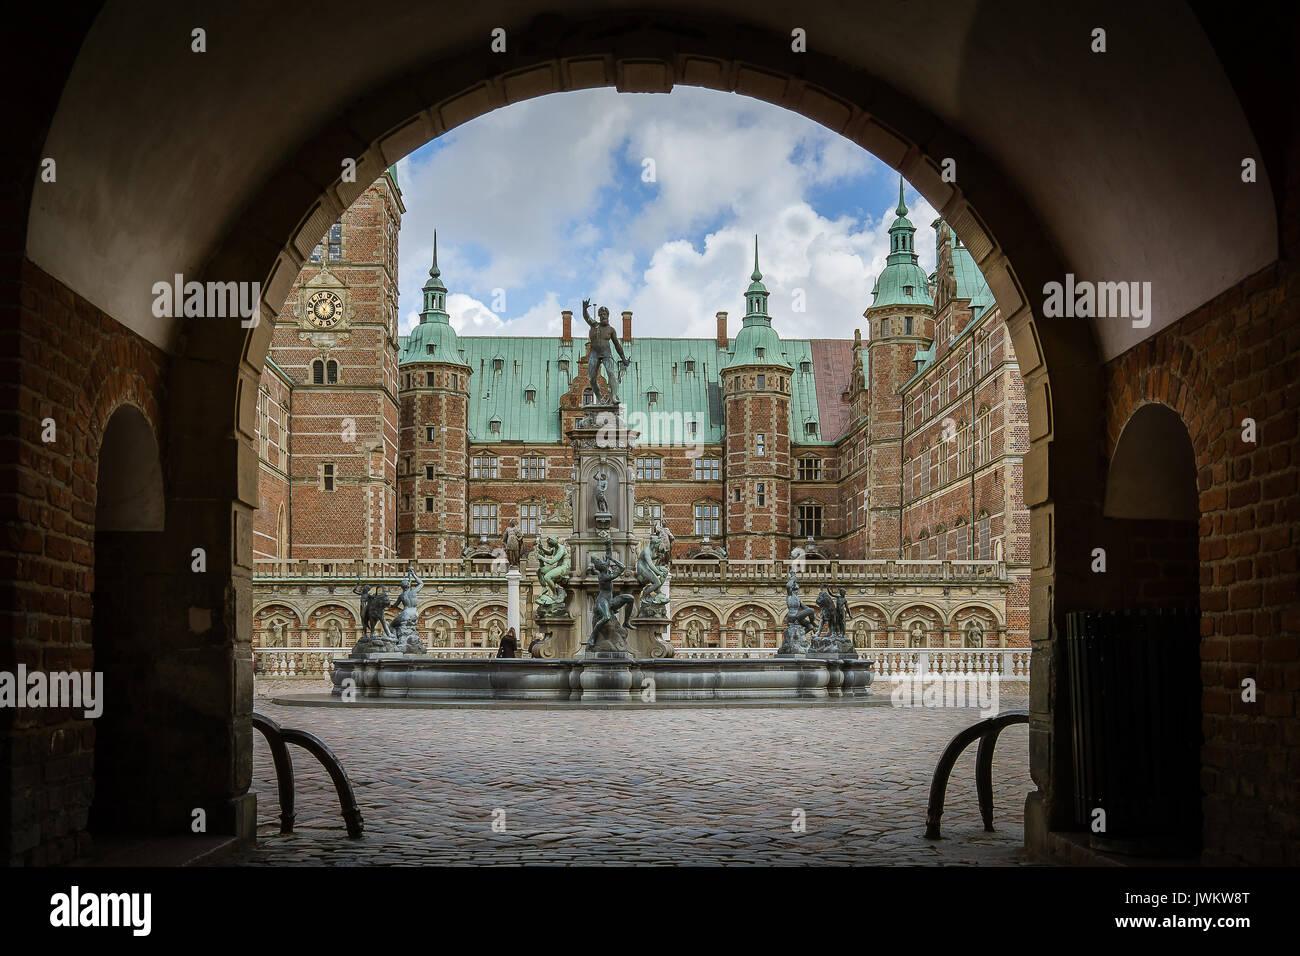 Entrance through the gate to Frederiksborg castle, the largest Renaissance residence in Scandinavia. Hillerod, Denmark, August 6, 2017 - Stock Image